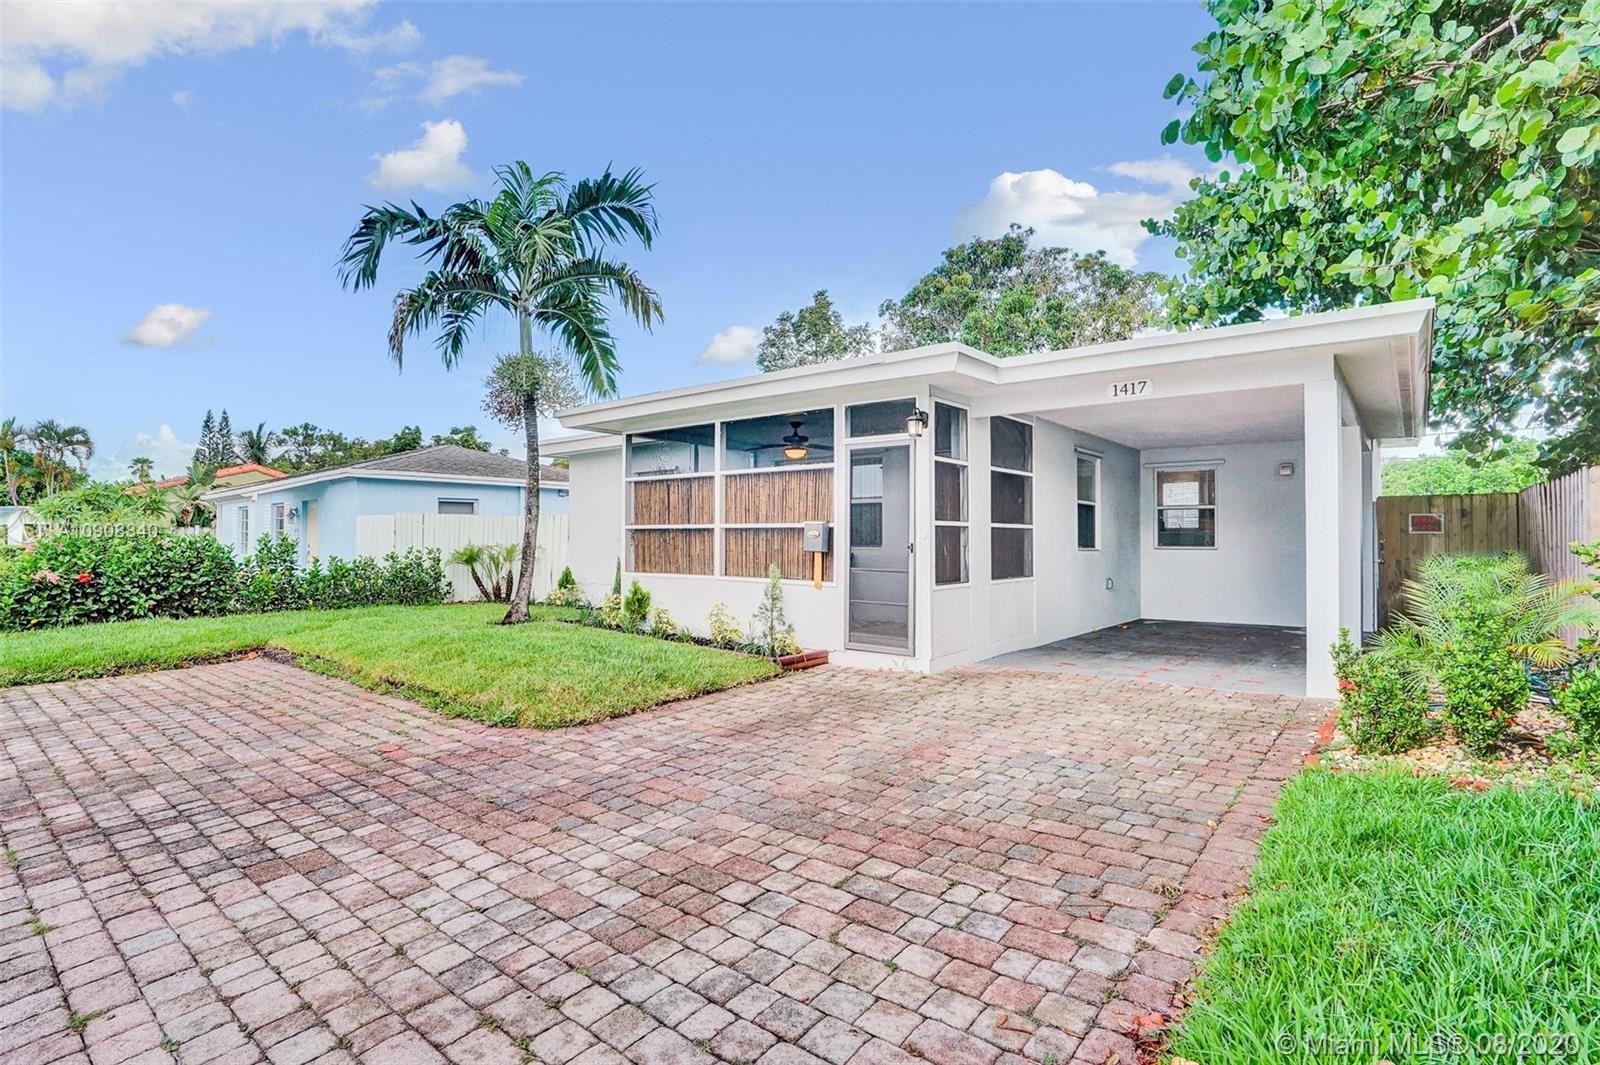 1417 N Andrews Ave, Fort Lauderdale, FL 33311 - #: A10908840